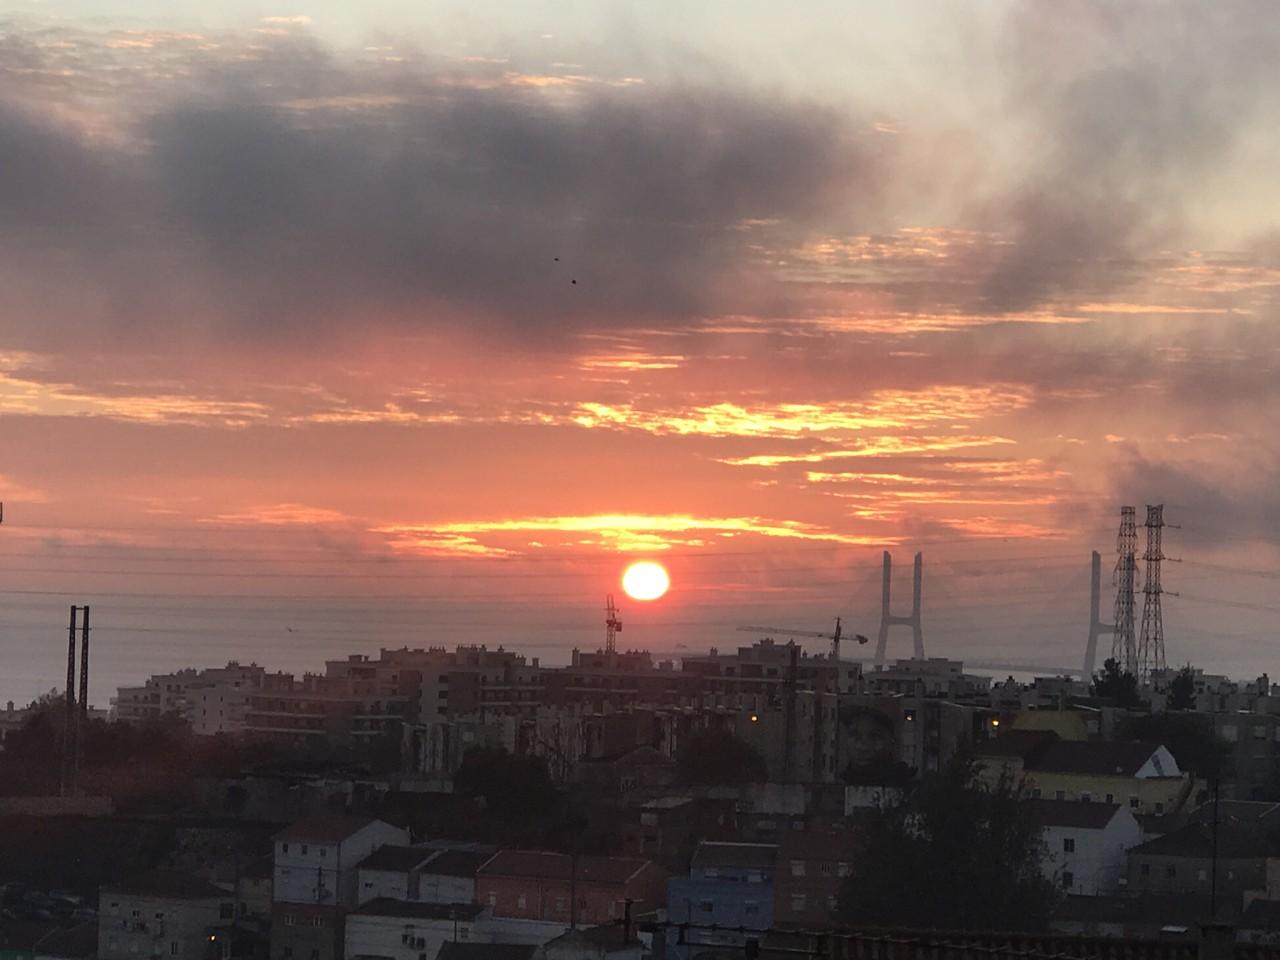 07:36